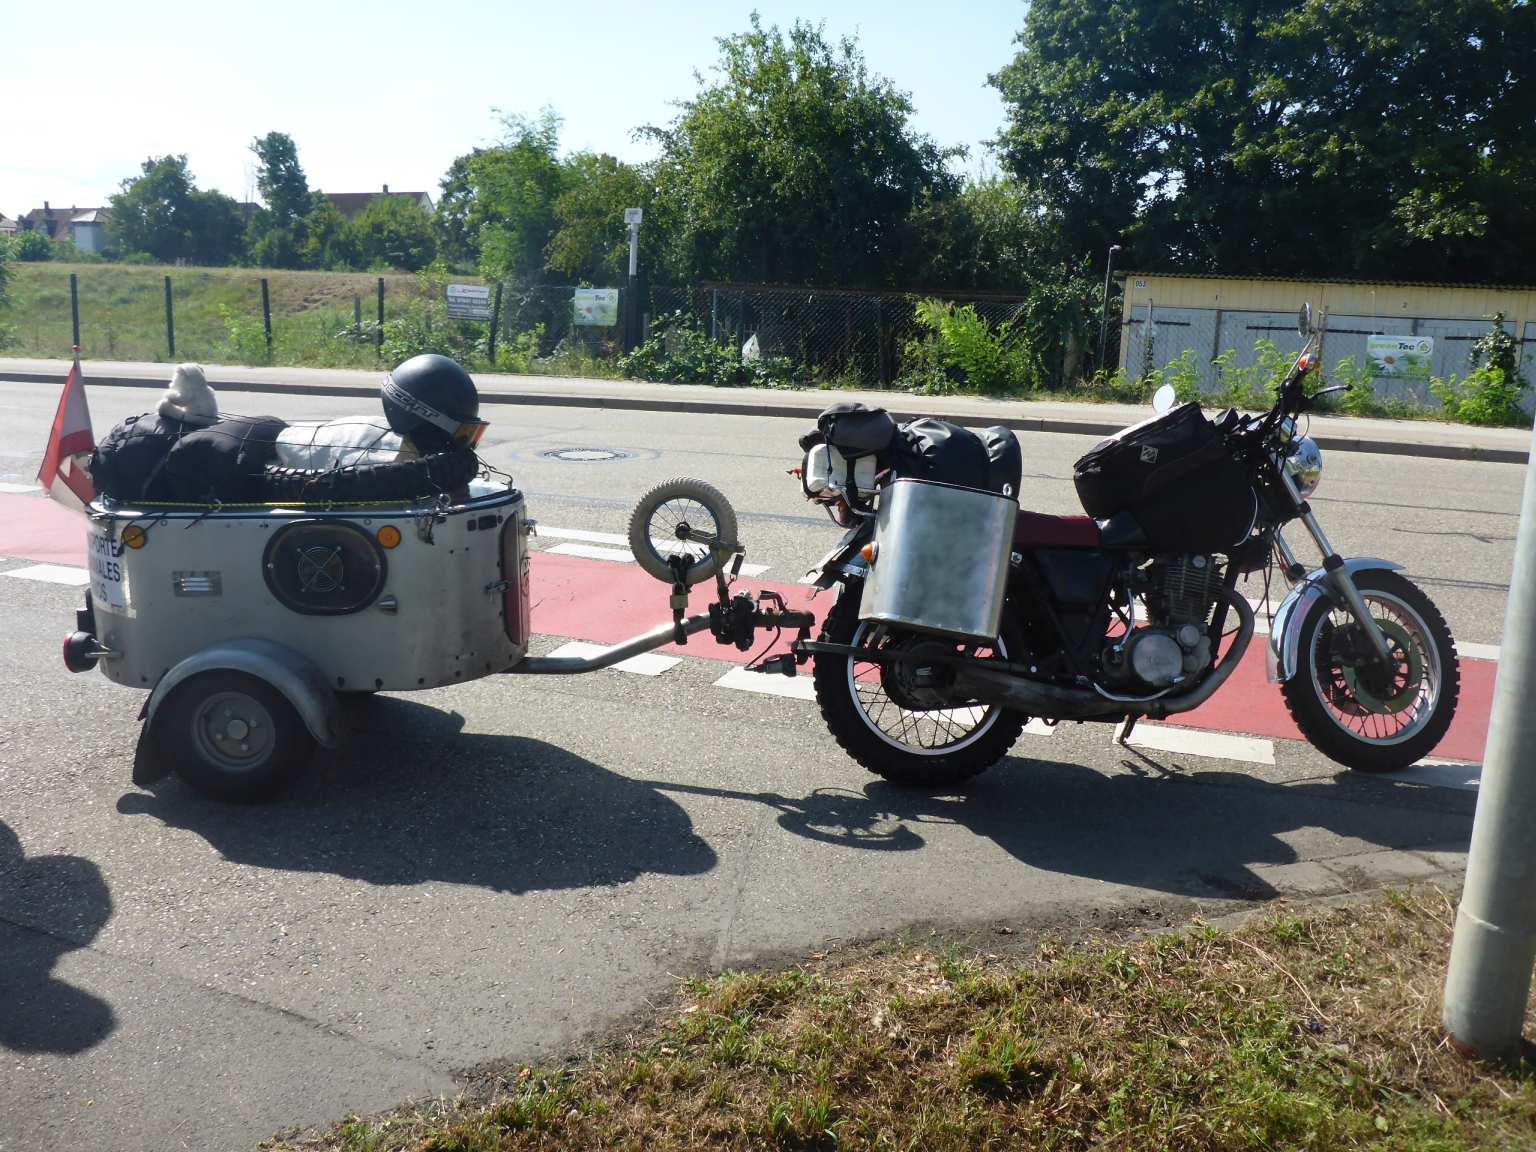 motorradanh nger geht das berhaupt motorrad tour online. Black Bedroom Furniture Sets. Home Design Ideas